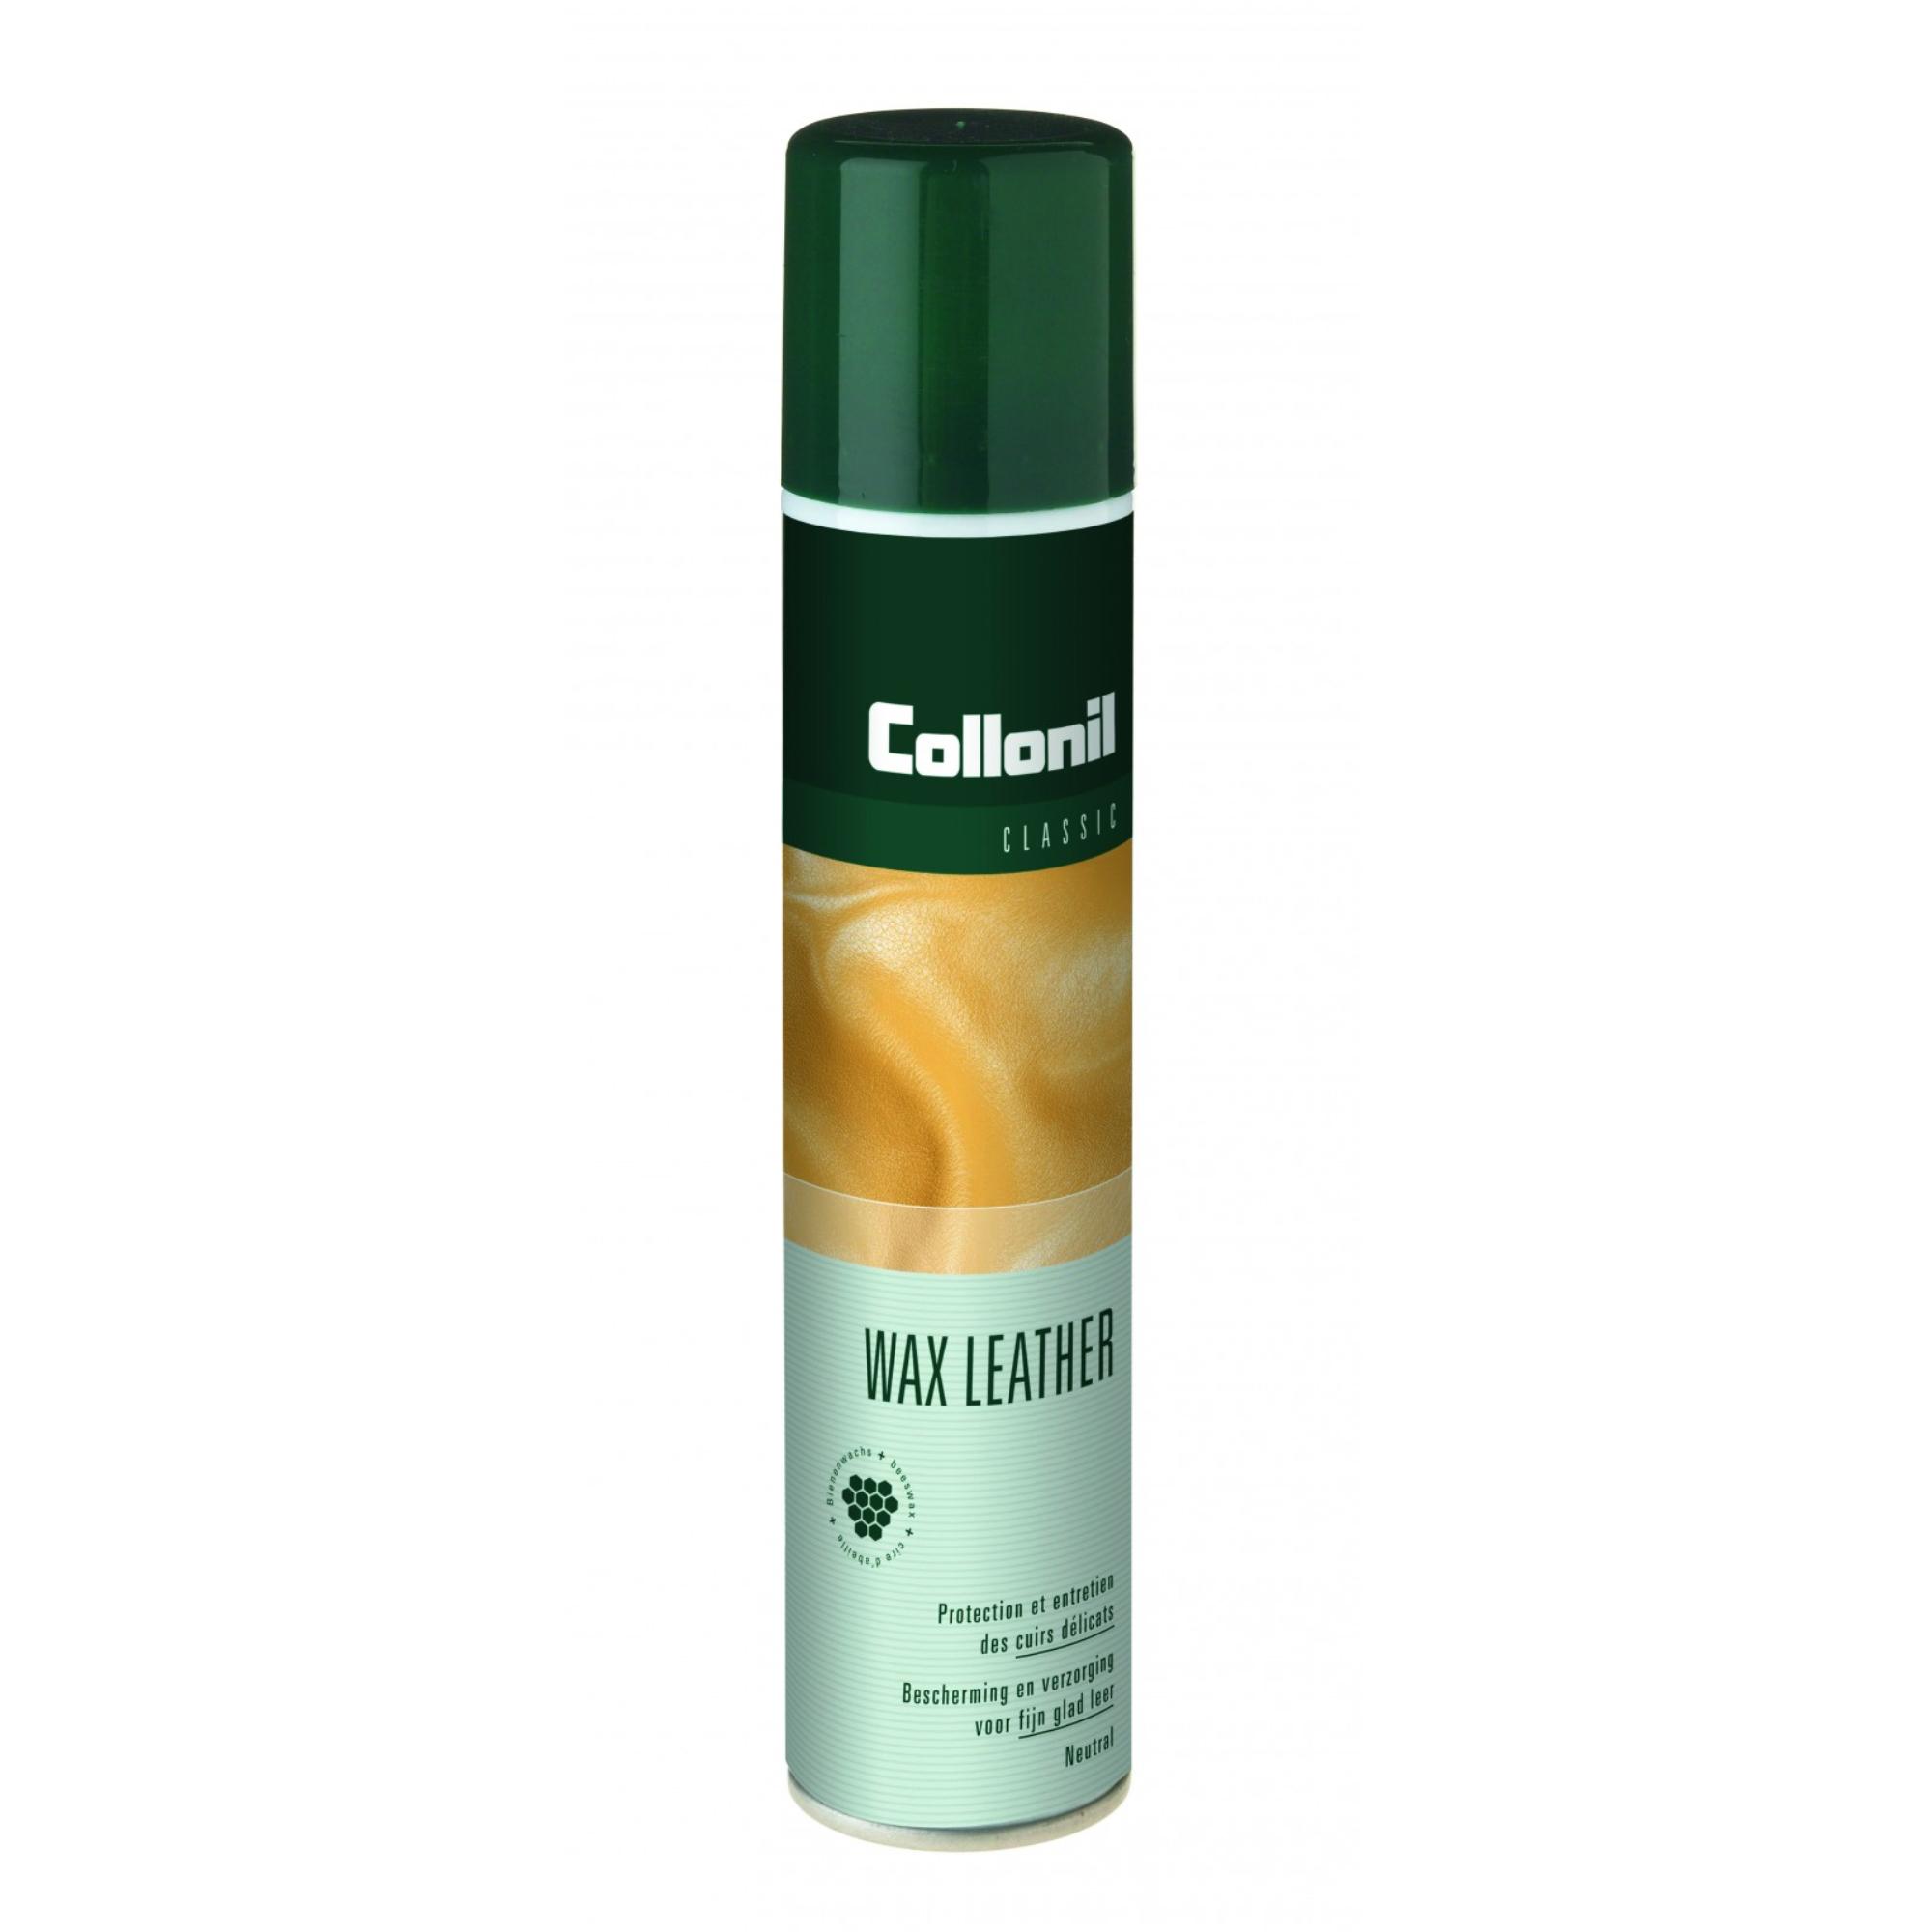 Collonil Wax Leather Spray 200ml